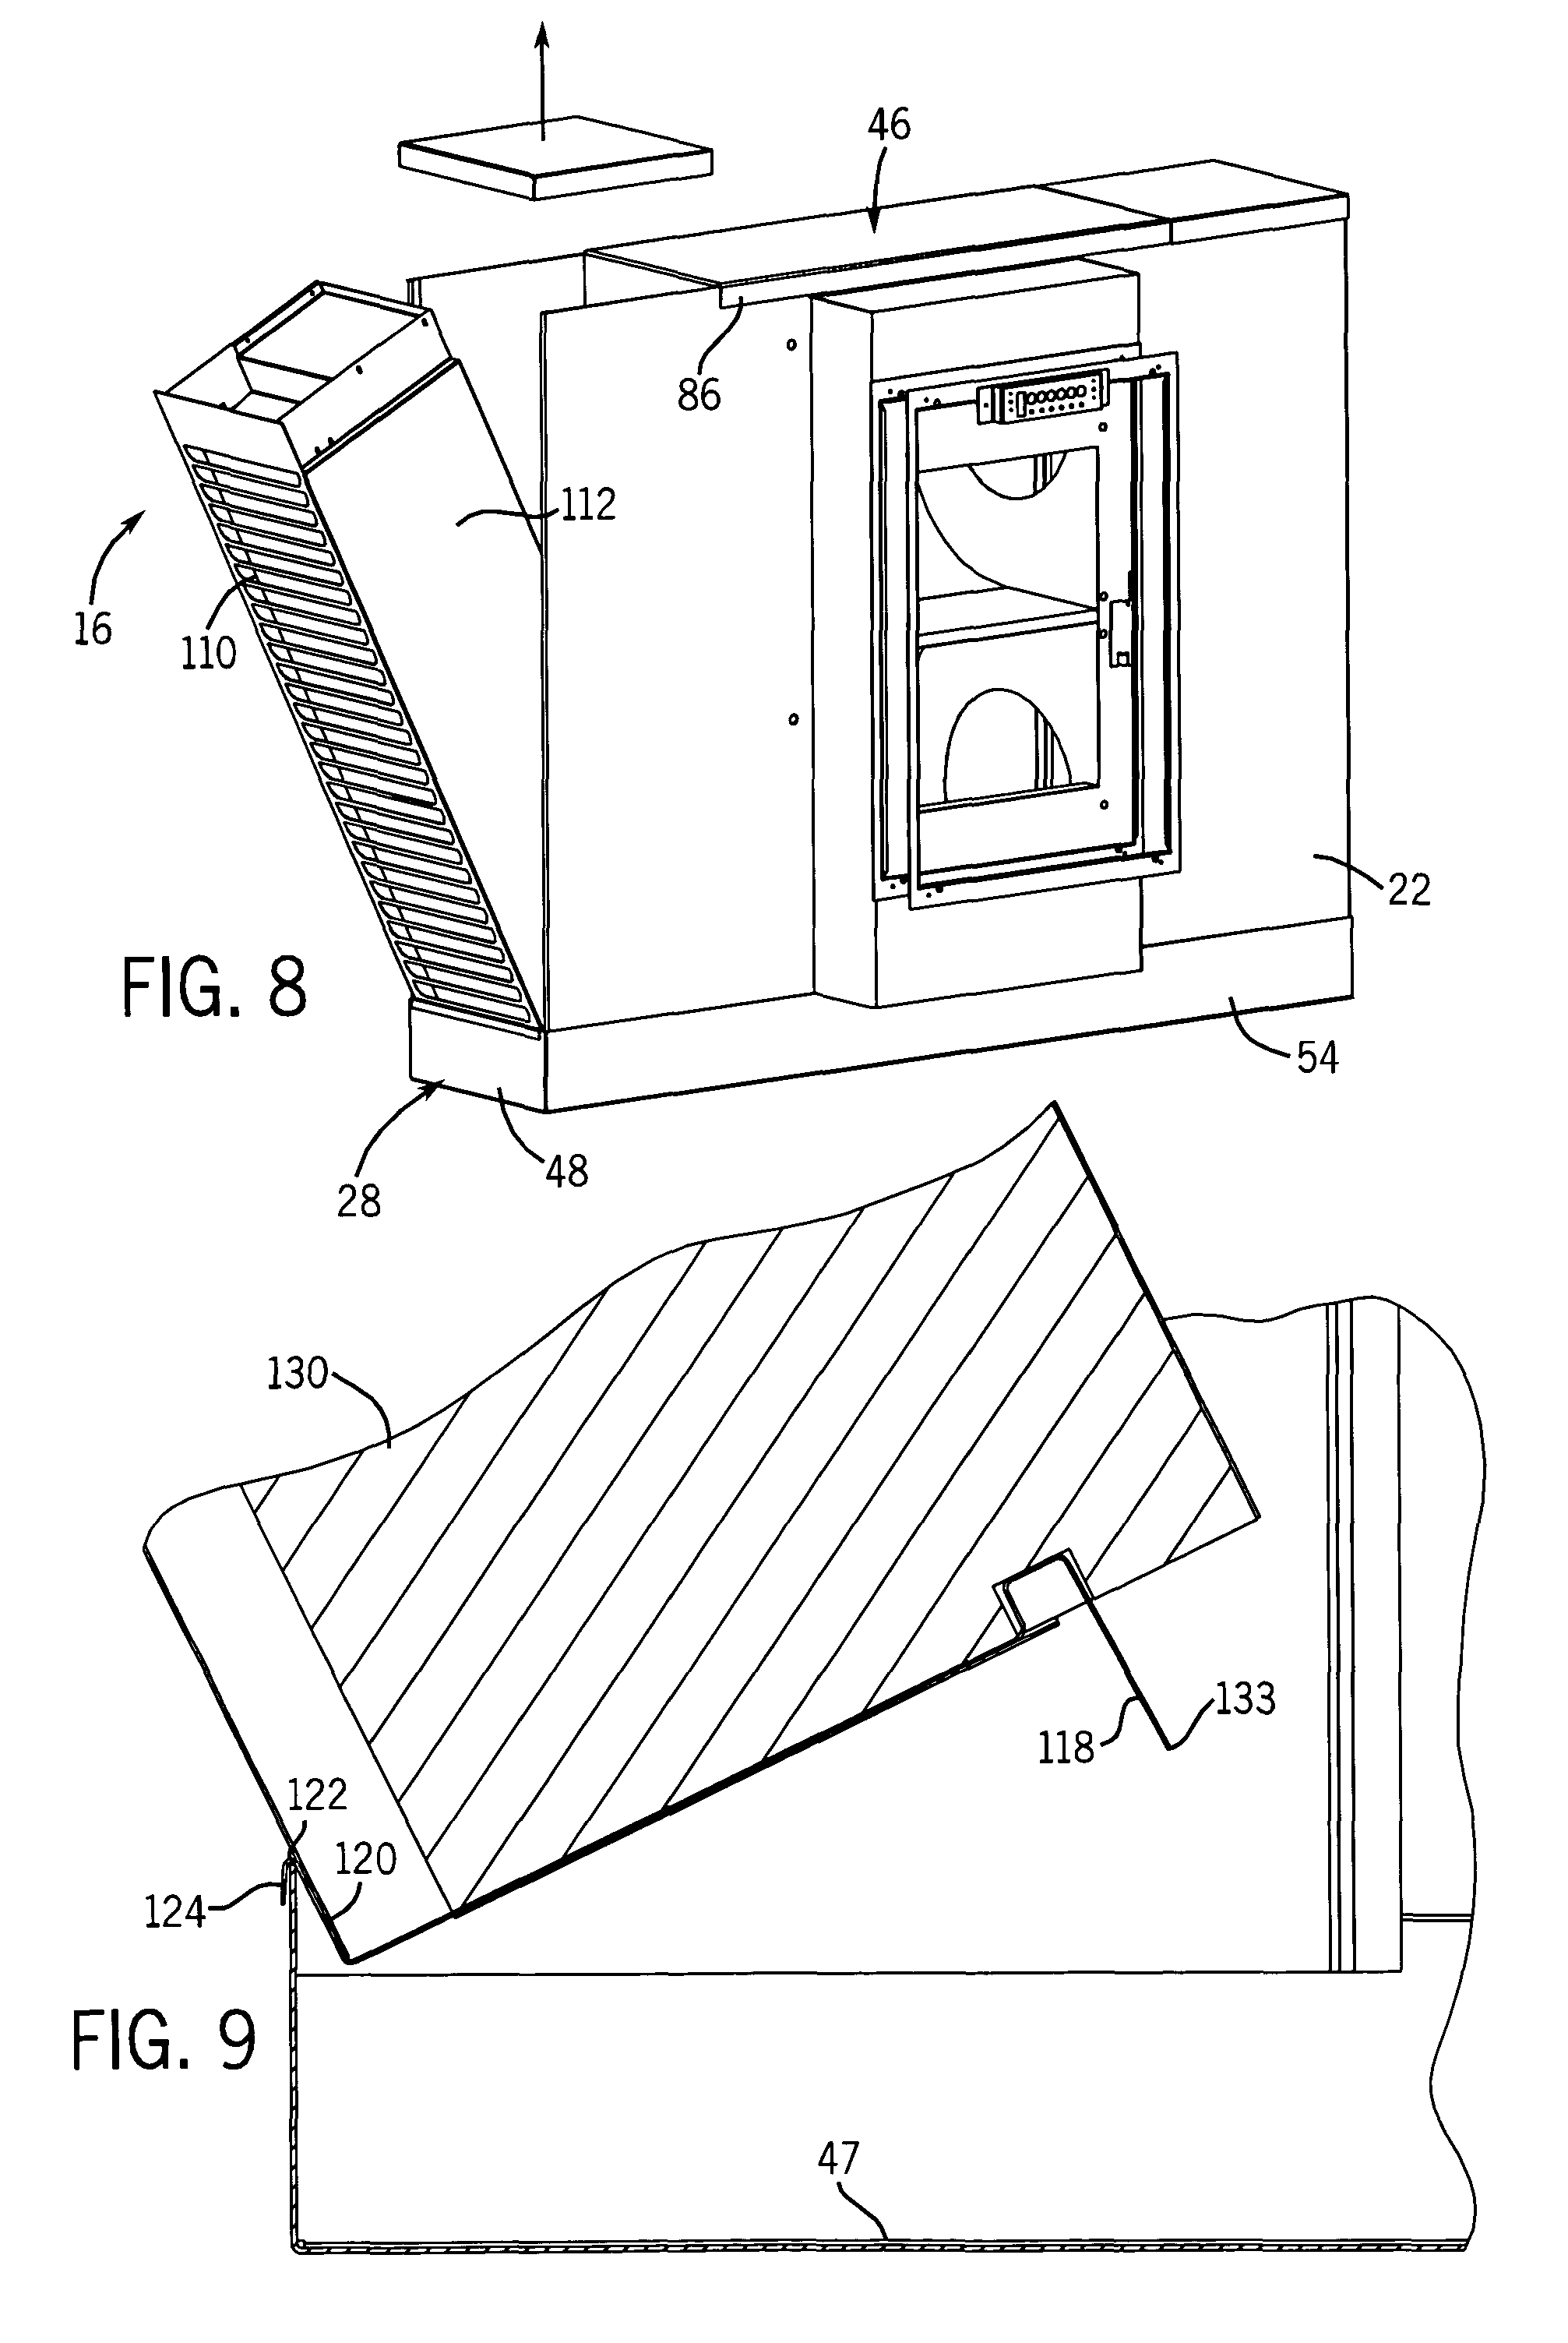 Patent Us7237401 - Low Profile Evaporative Cooler